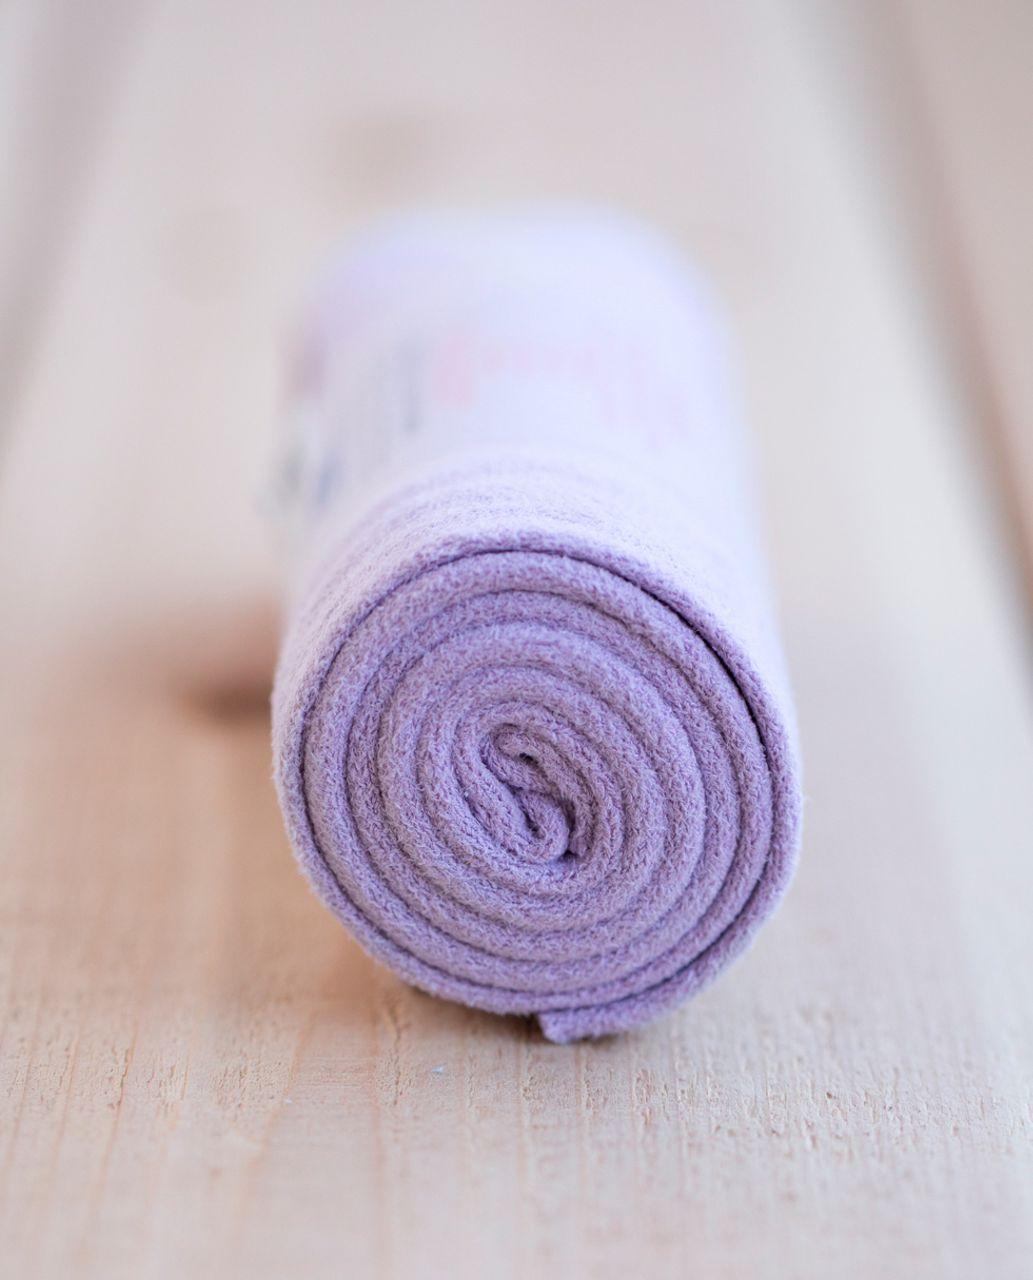 Lululemon The Towel - Storm Mauve